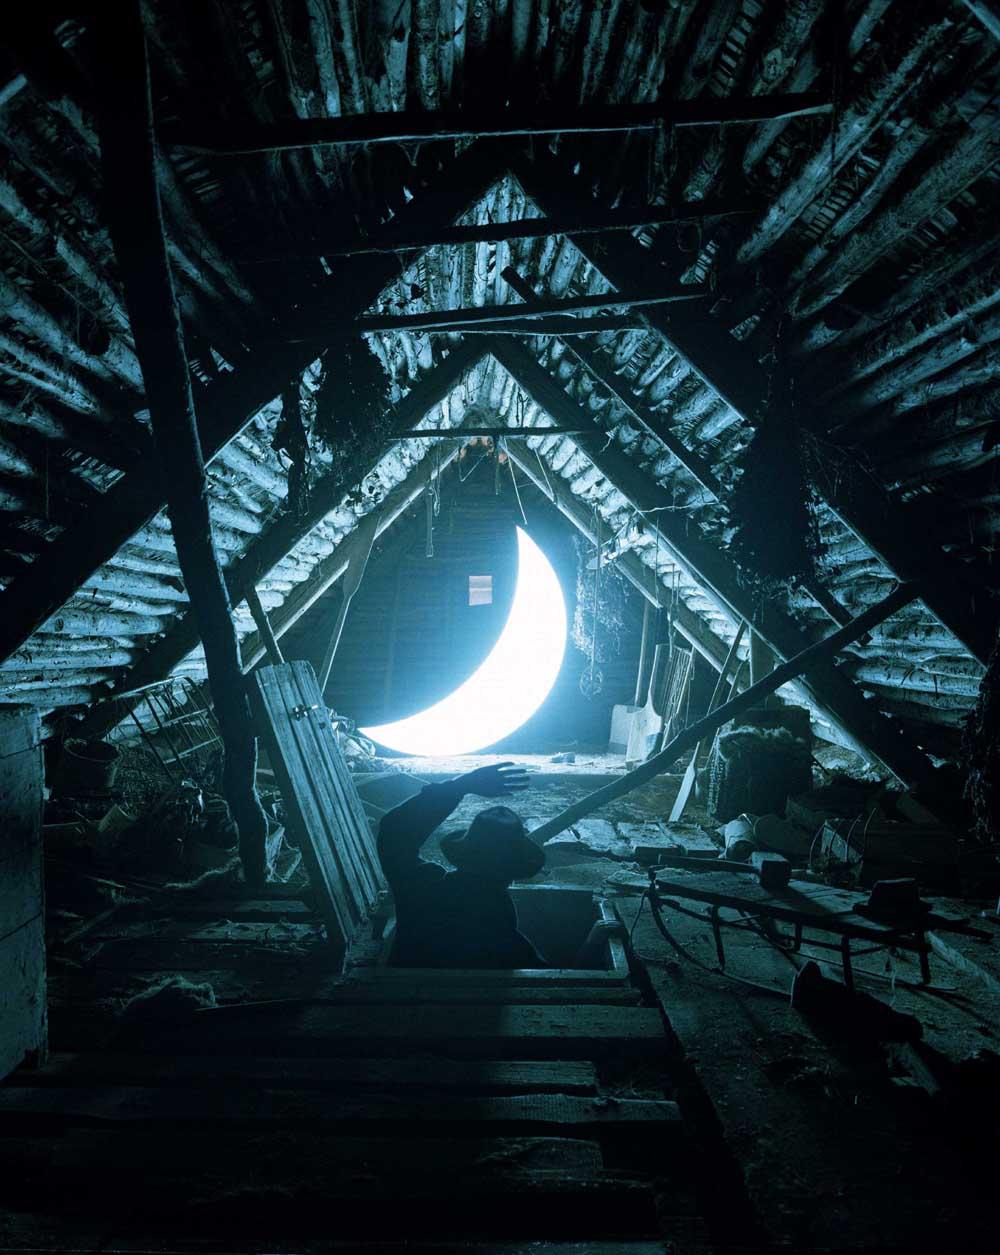 Leonid Tishkov, Boris Bendikov, Private Moon, Photography, Dreamy, Moon, Night, Surreal